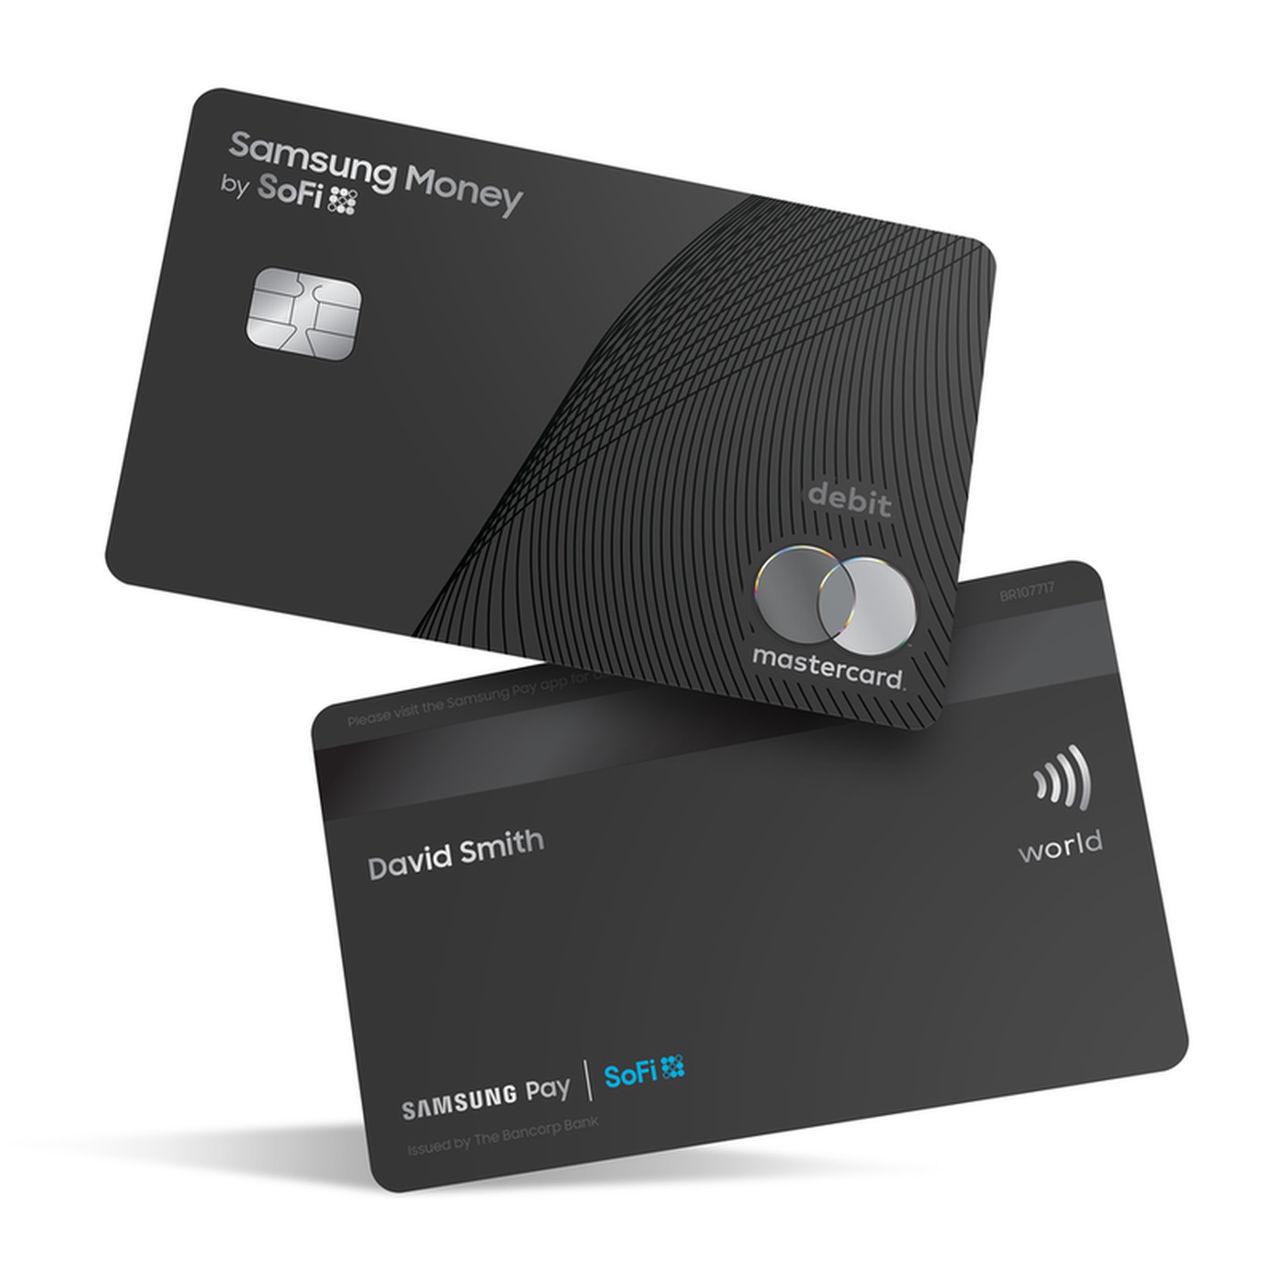 Samsung lanserar betalkortet Samsung Money